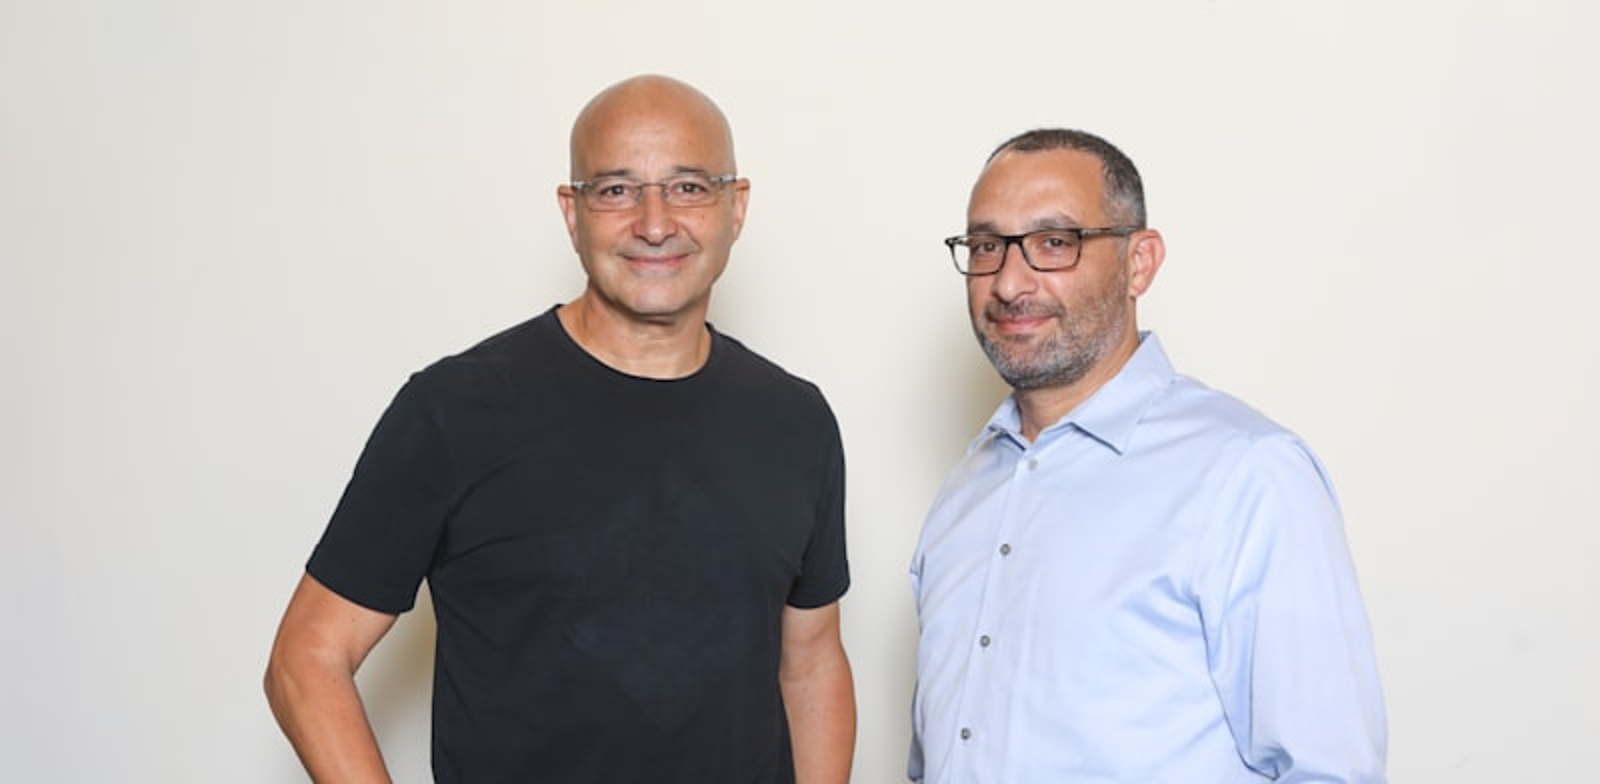 Yossi Carmil and Yossi Ofek Photo: Shay Shviro